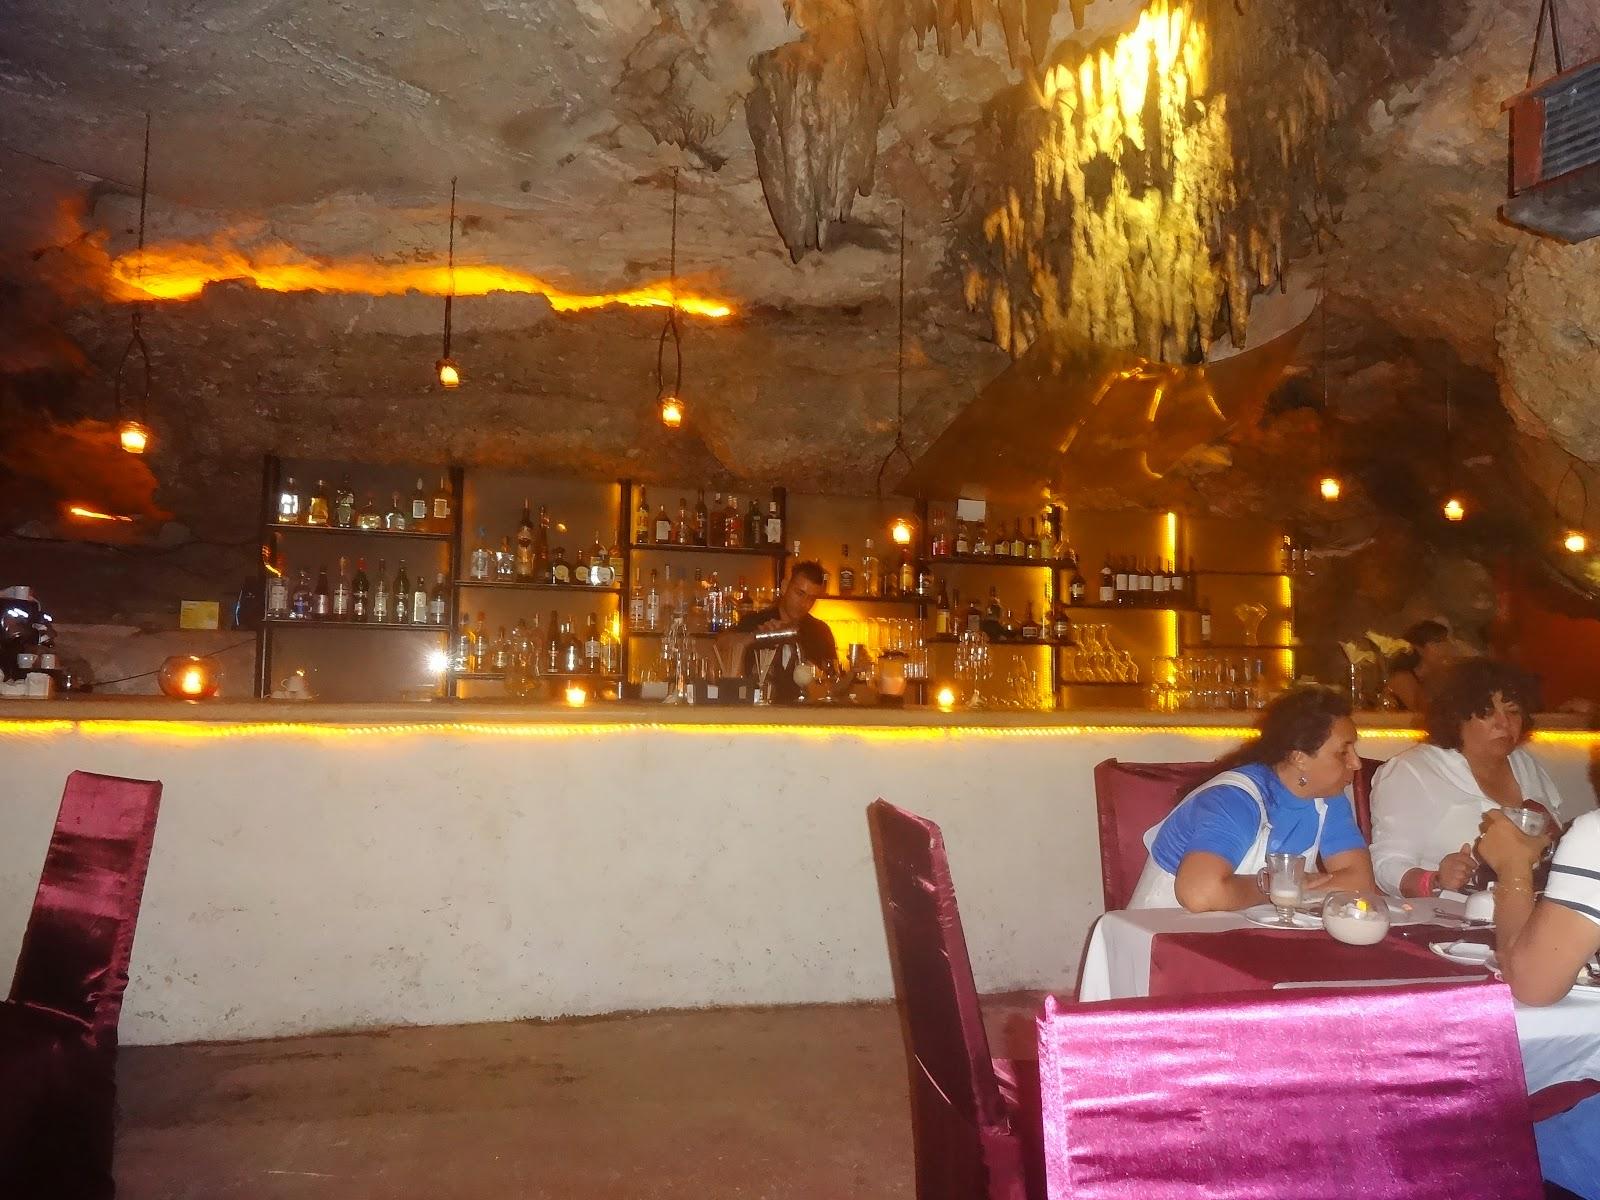 restaurante Alux - Playa del Carmen - Cancun